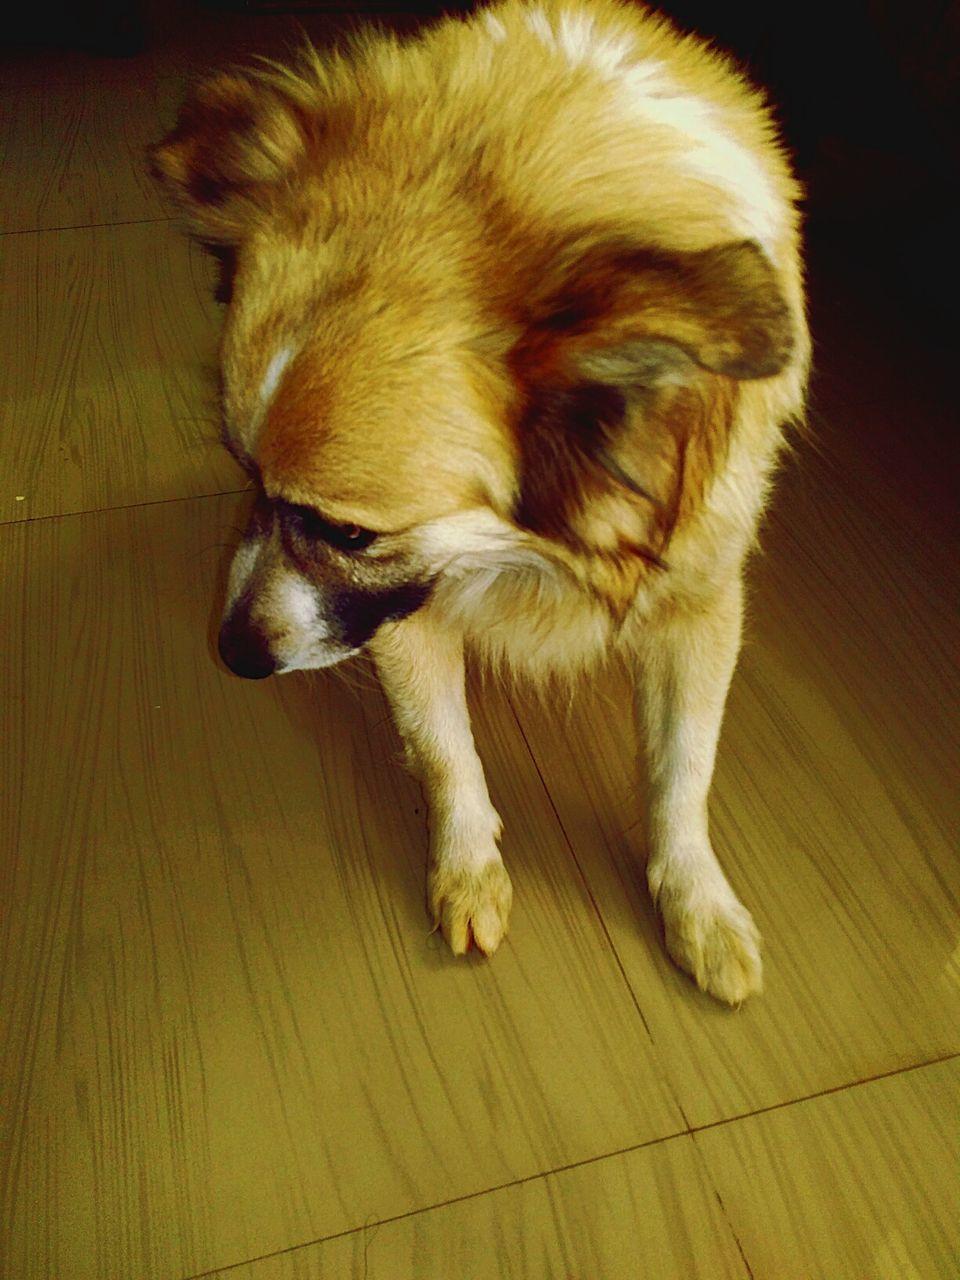 pets, hardwood floor, domestic animals, one animal, dog, mammal, animal themes, indoors, close-up, no people, day